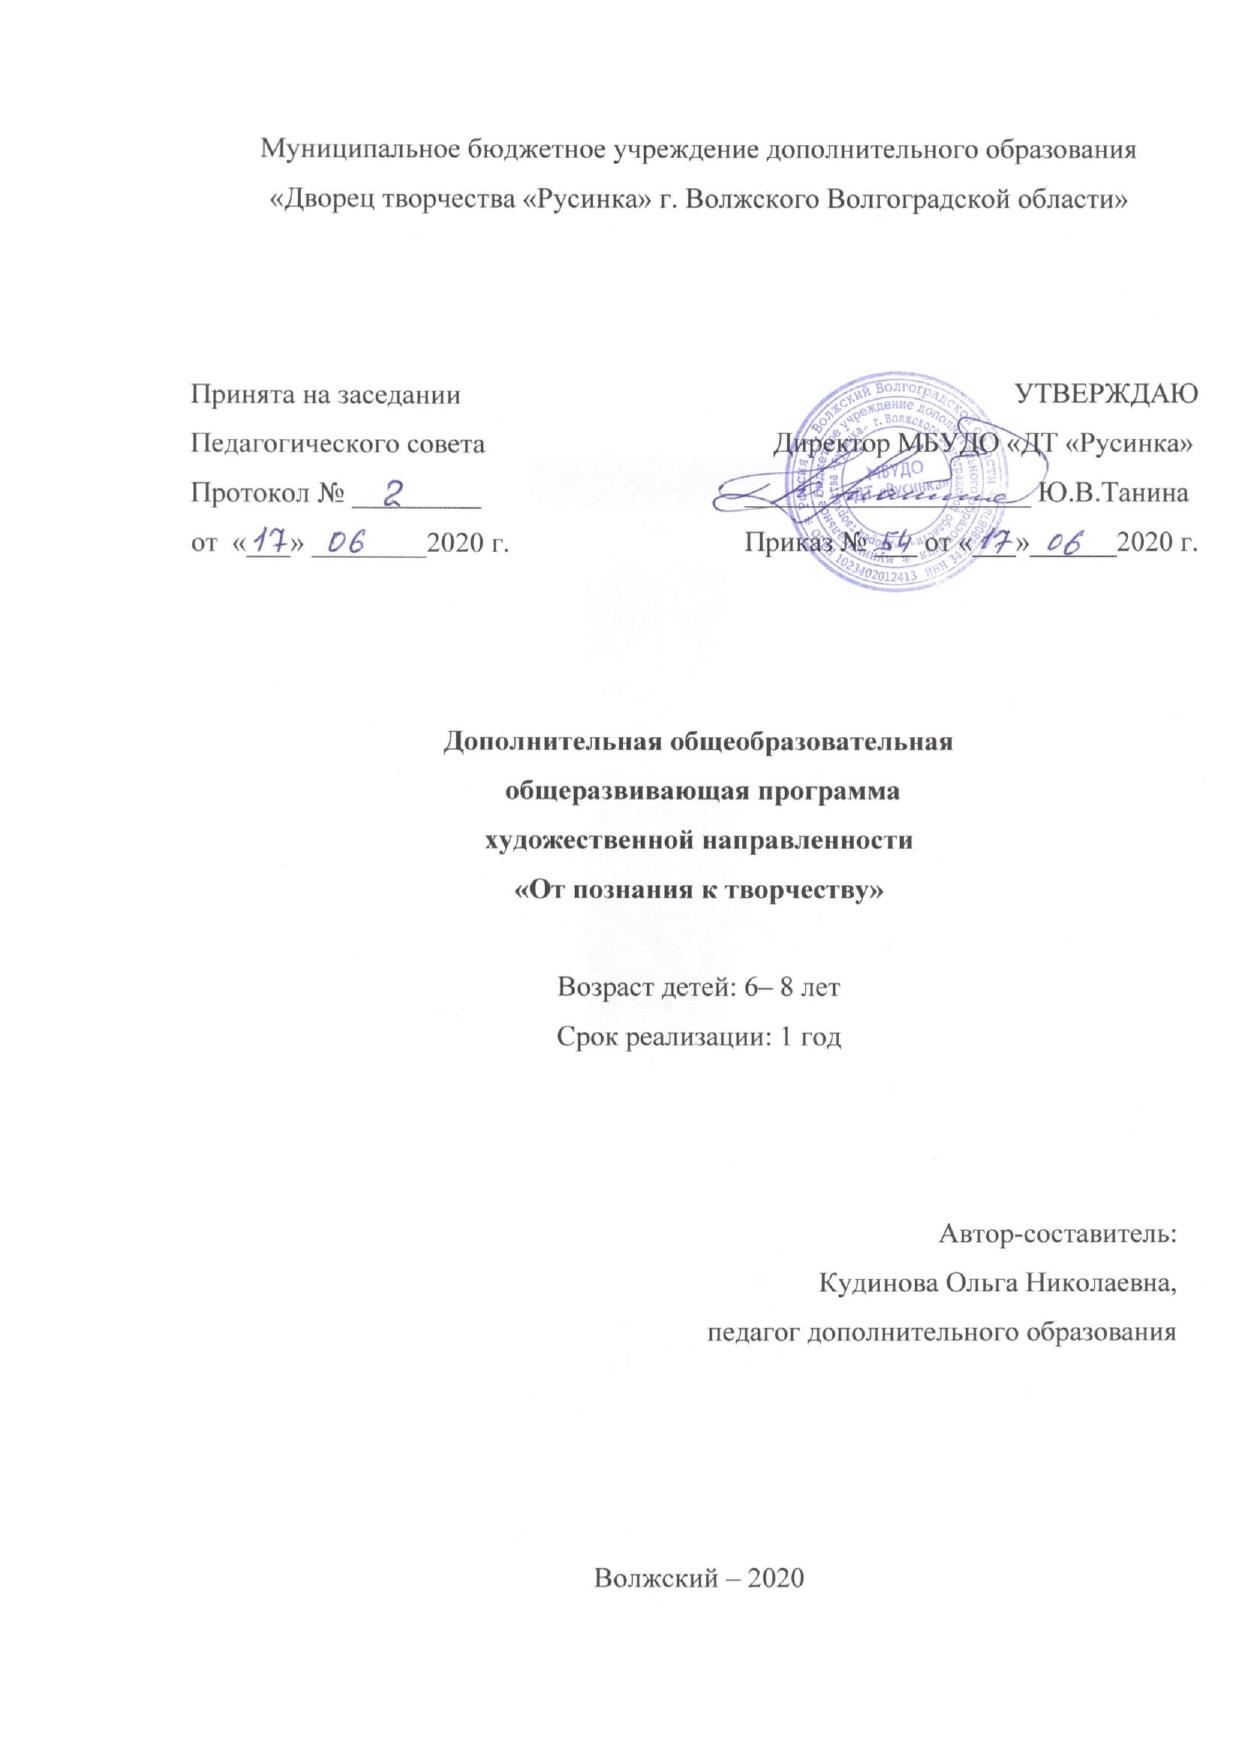 ДООП От познания к творчеству_pages-to-jpg-0001